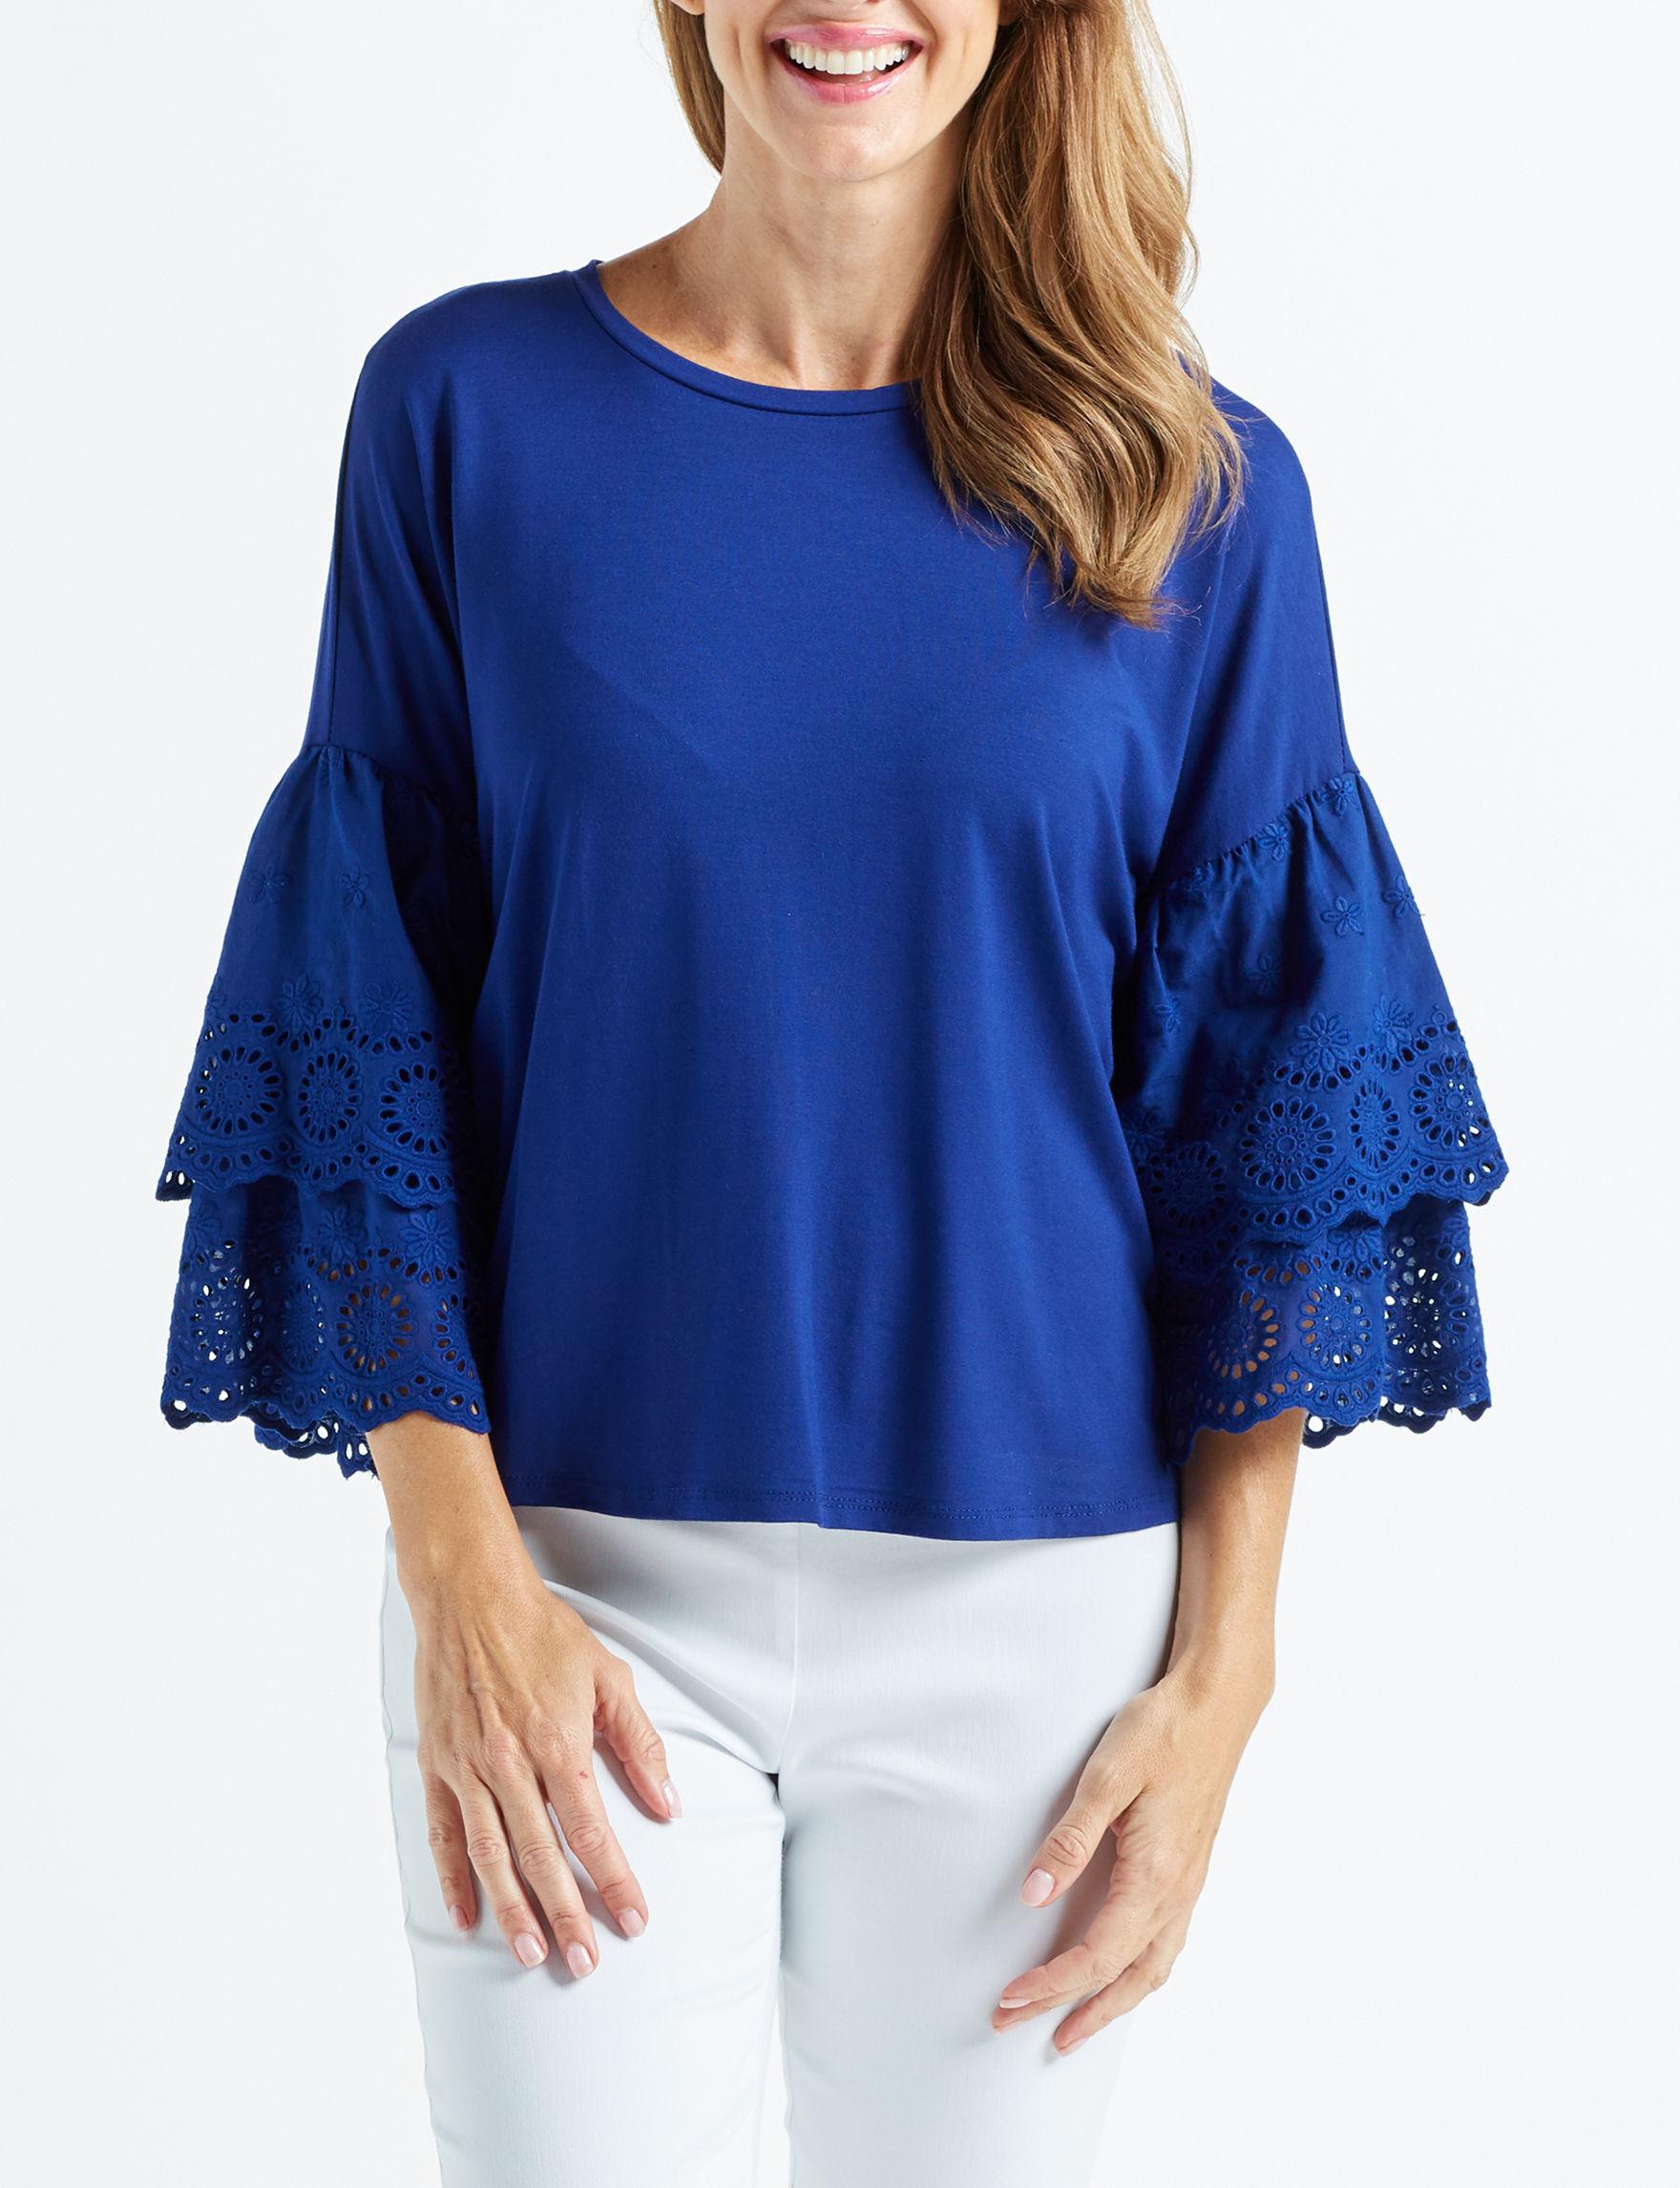 Blush Collection Royal Blue Shirts & Blouses